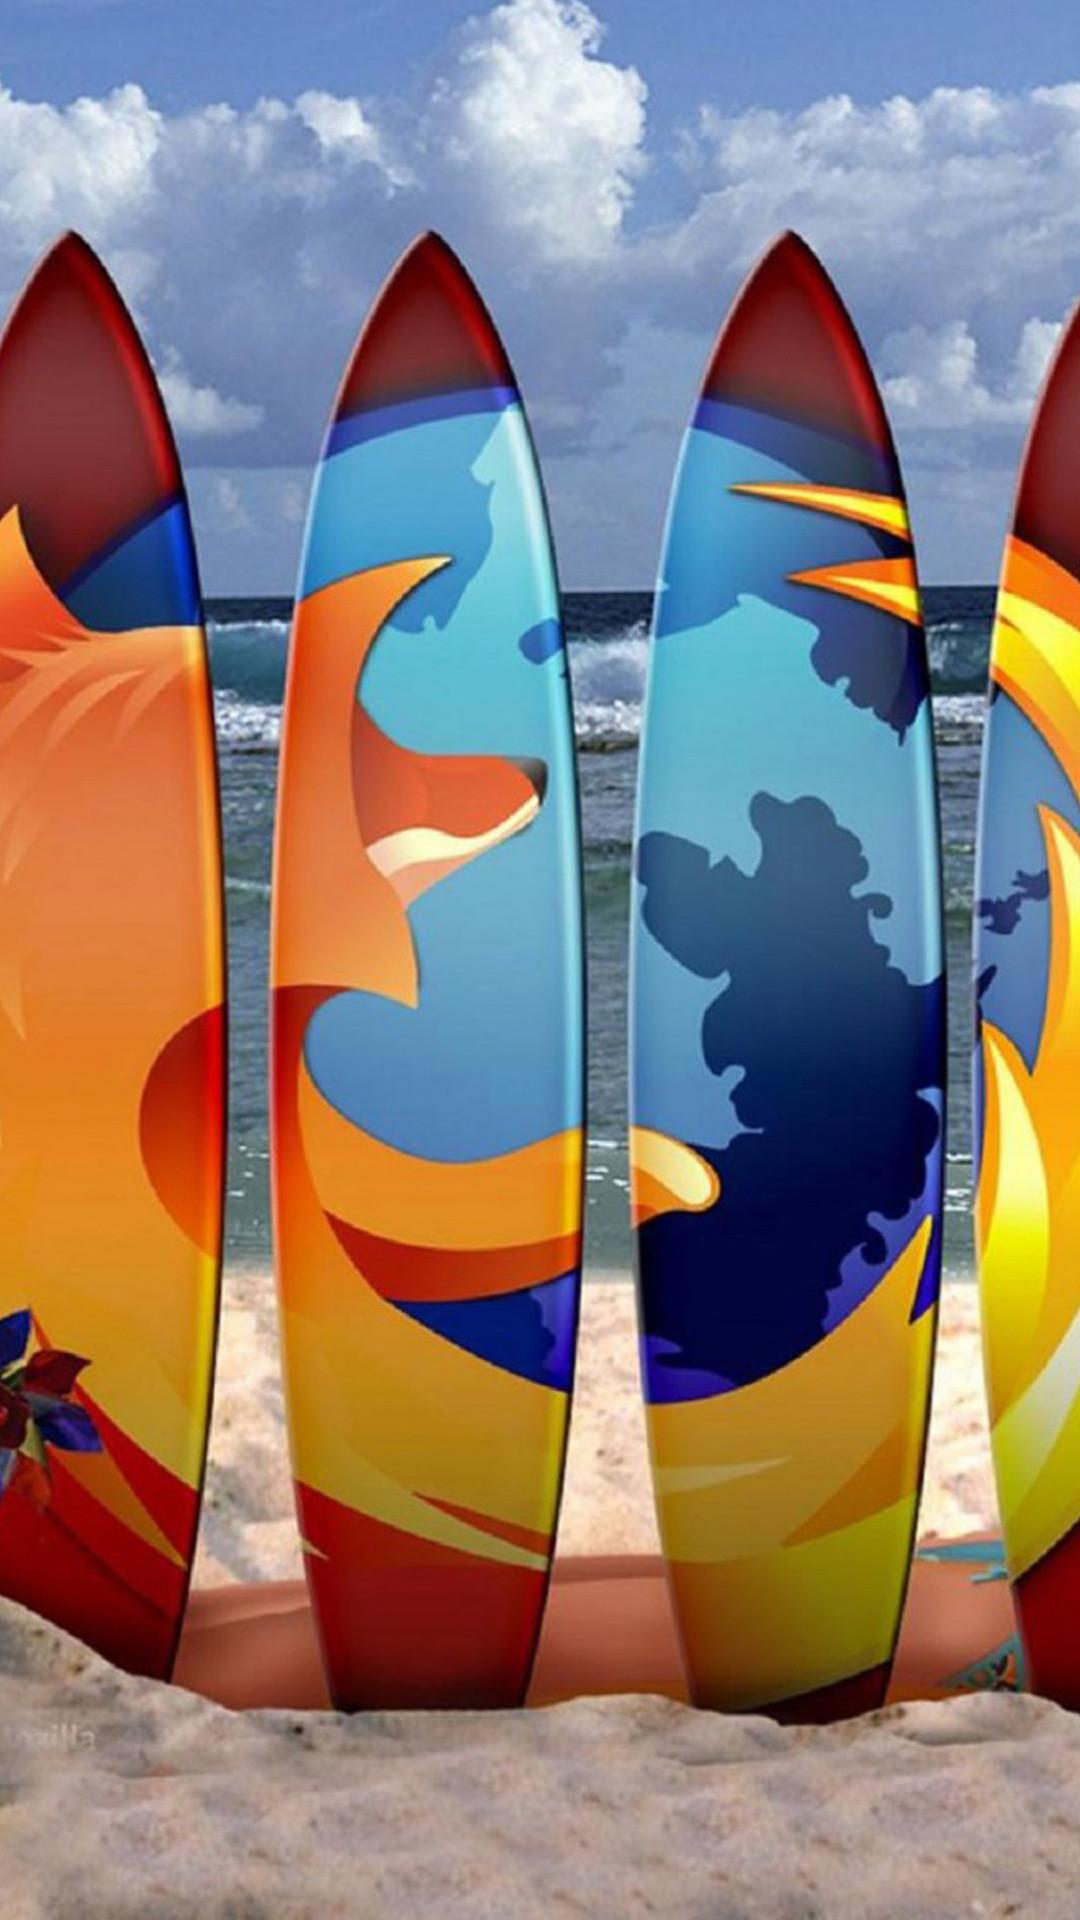 Firefox Surf Boards Beach iPhone 6 Plus HD Wallpaper …